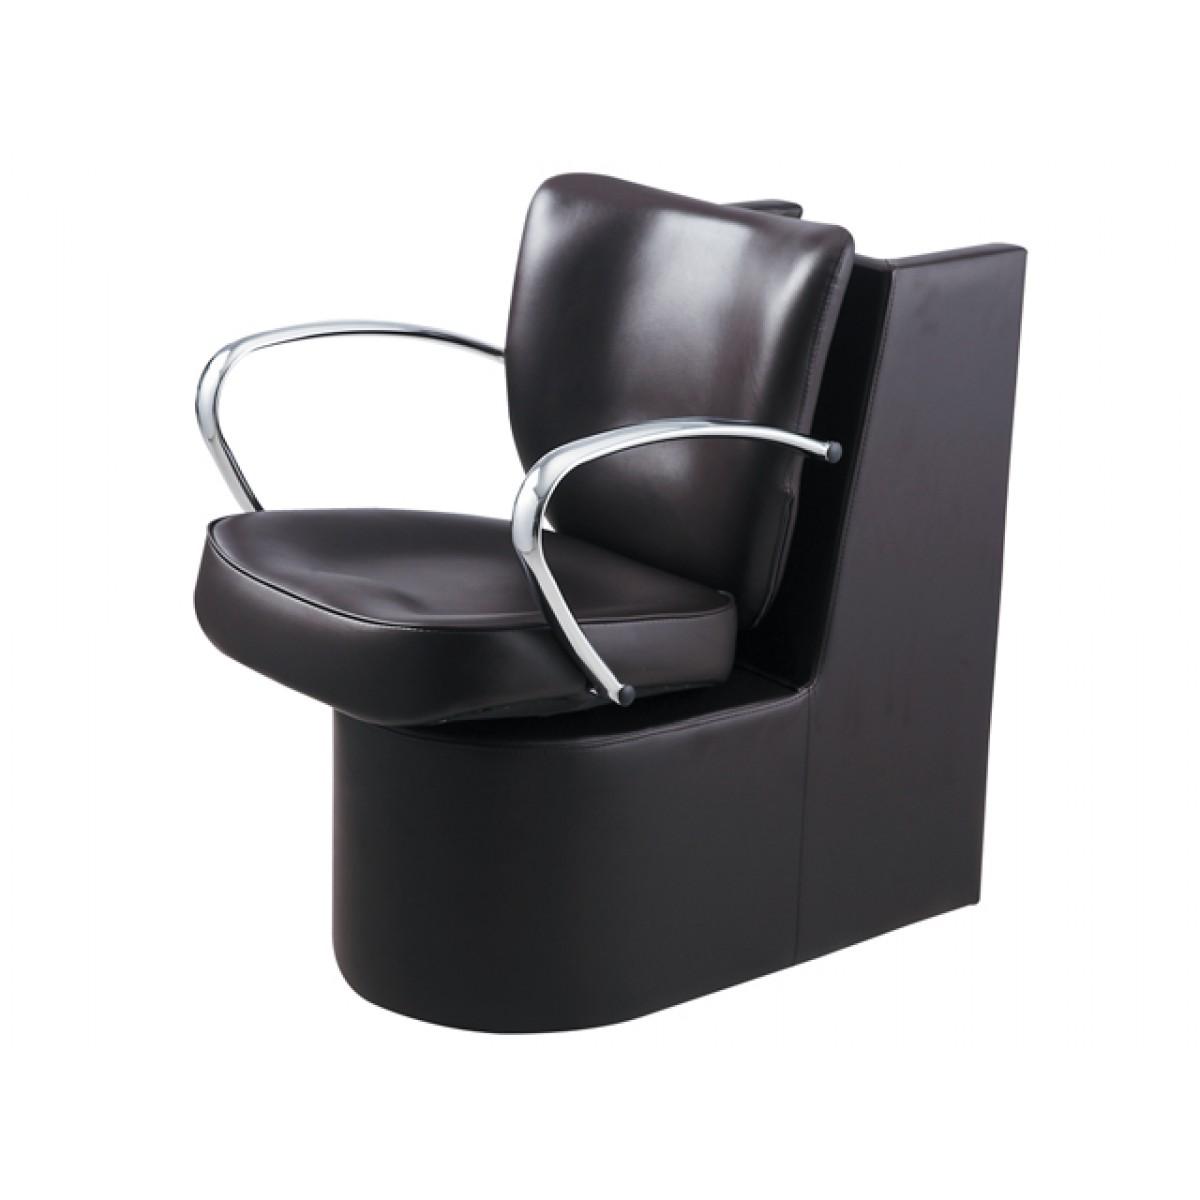 chair hair dryer wheels for legs quotvenus quot